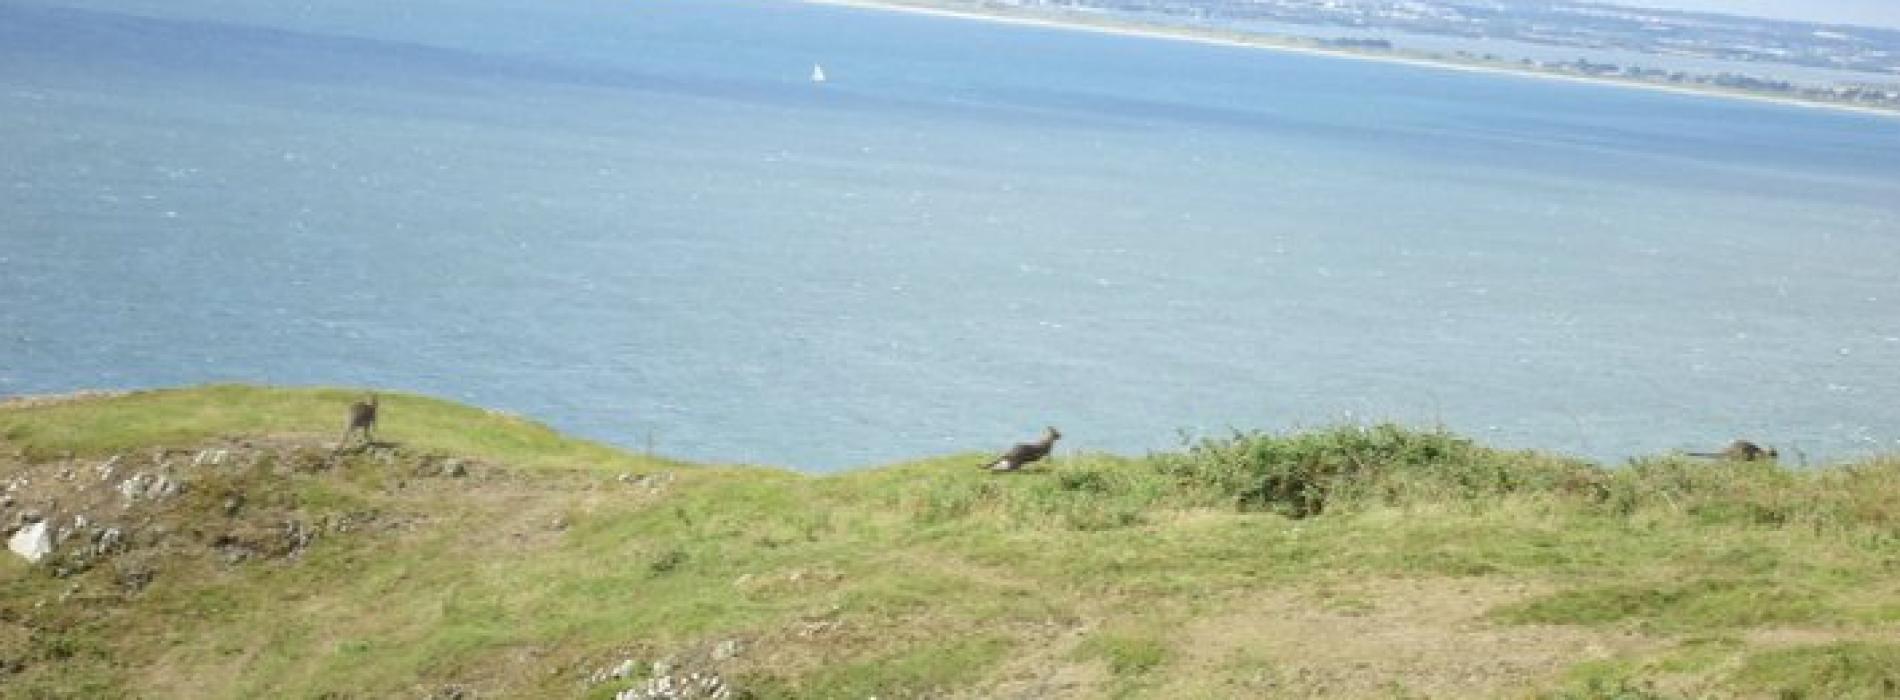 The Wild Wallabies of Ireland